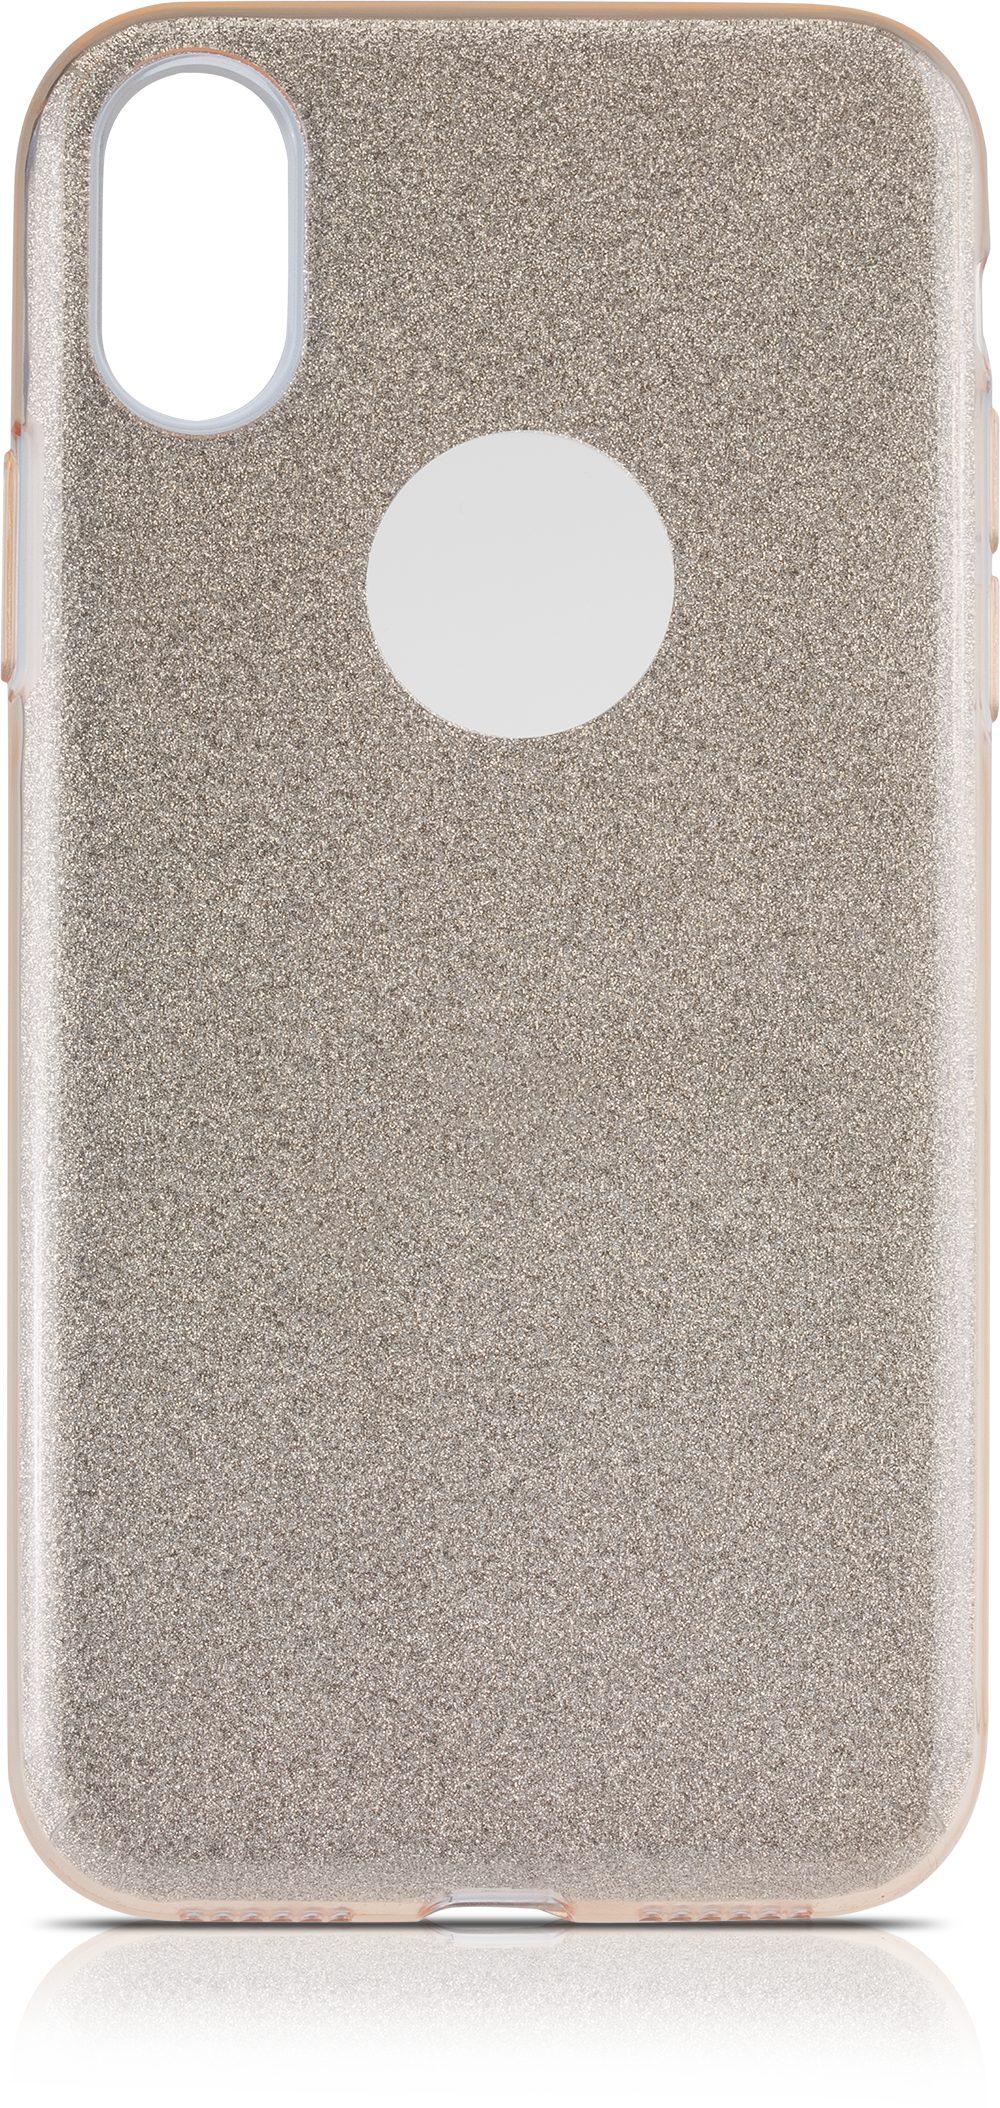 Scutes Deluxe GSM - Zubehör »Schutzhülle TPU - iPhone X glitzer gold«